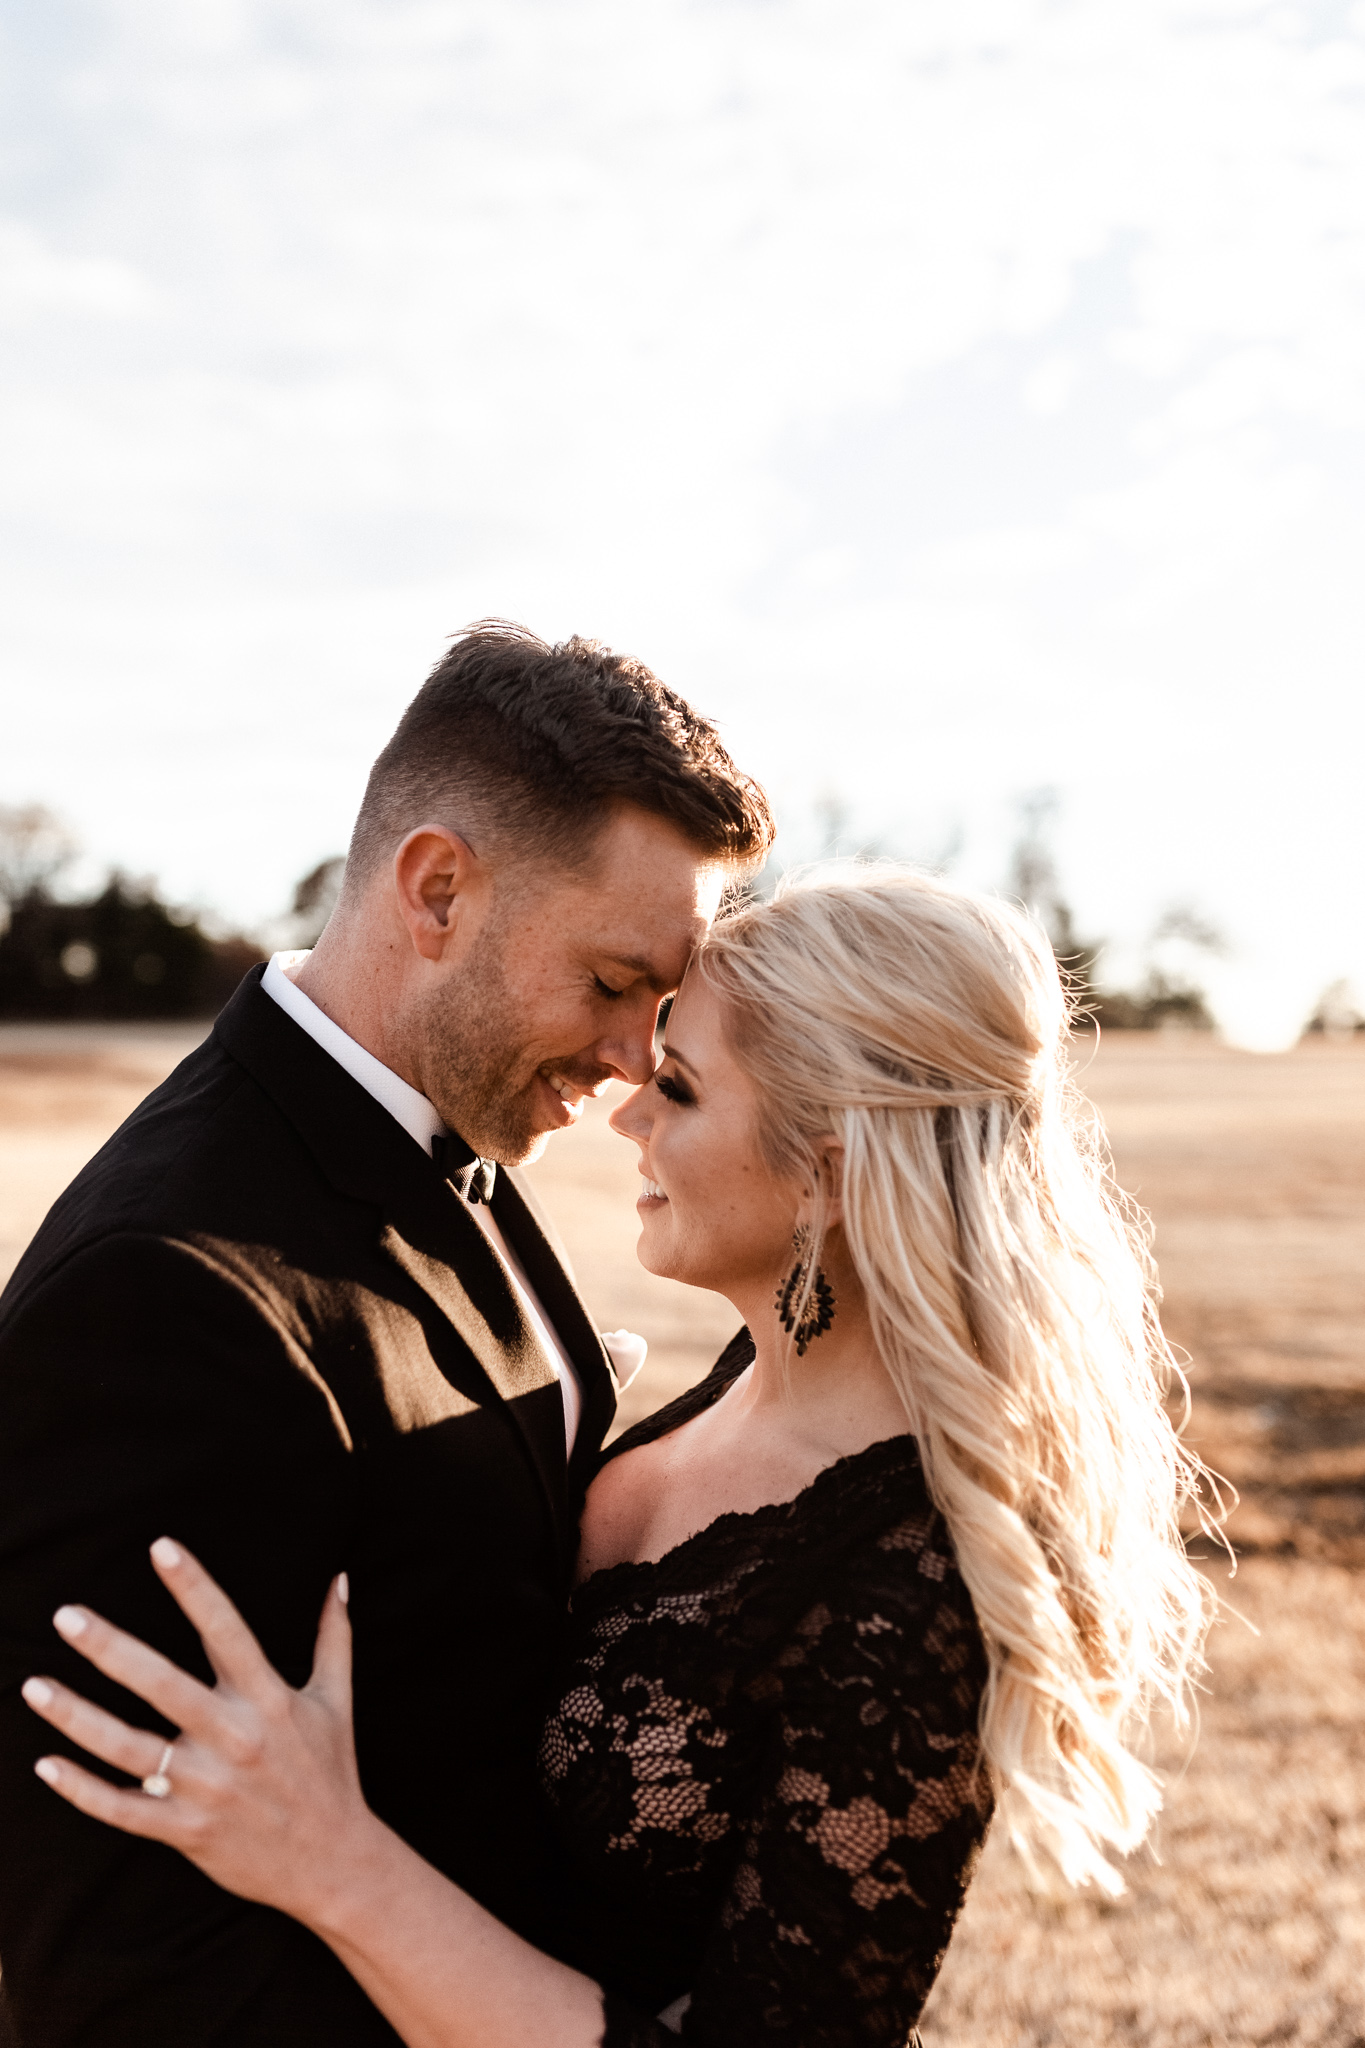 Wade + Stephanie | Warm Open Field Engagements | Oklahoma Wedding Photographer-41.jpg